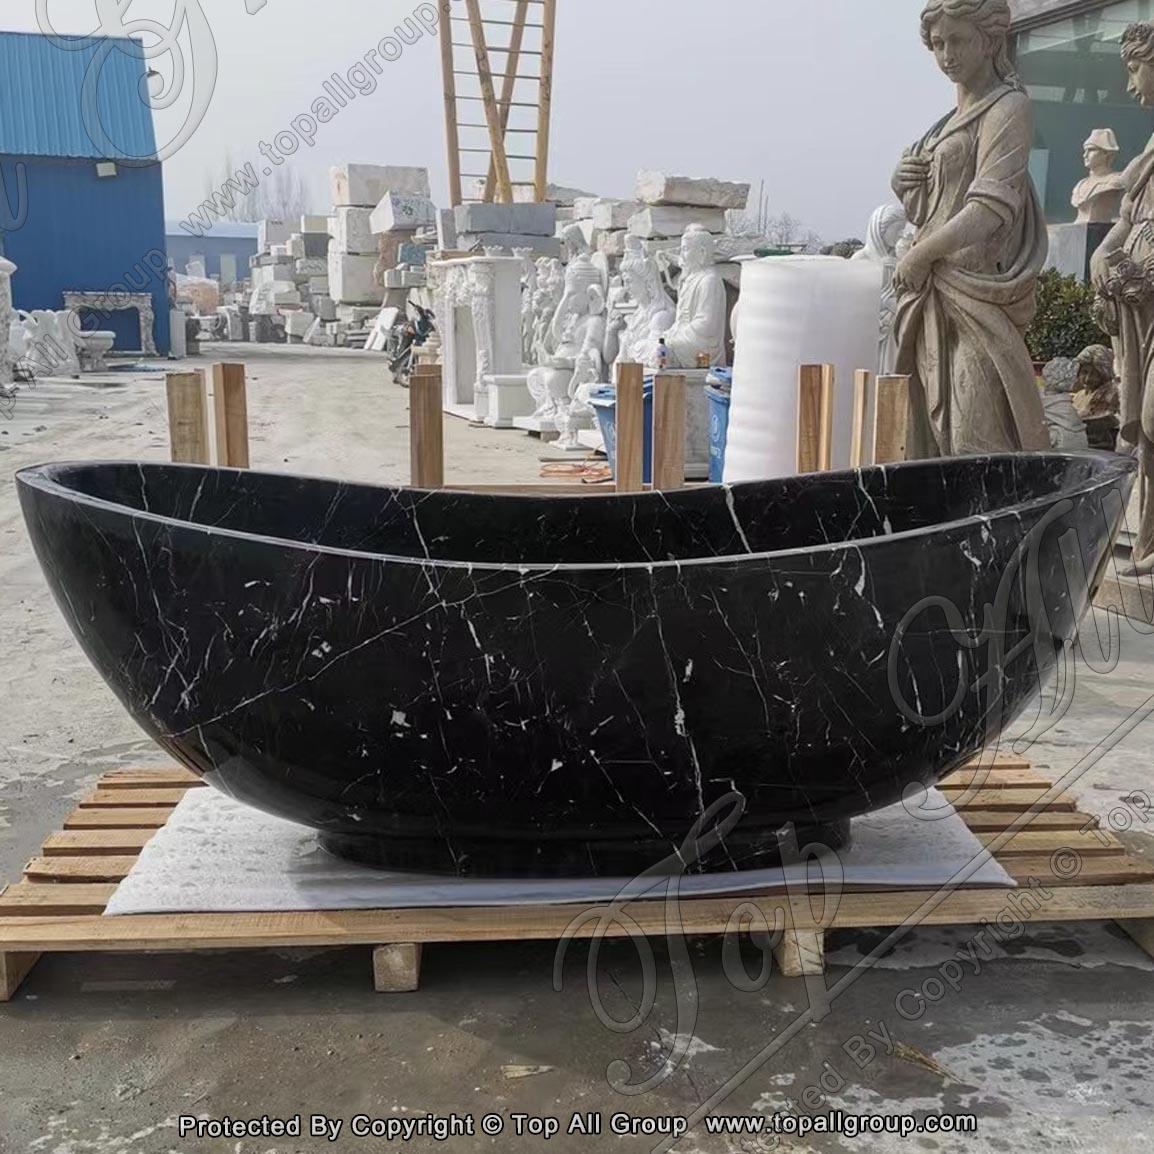 Black Marble Stone Bathtub For Sale